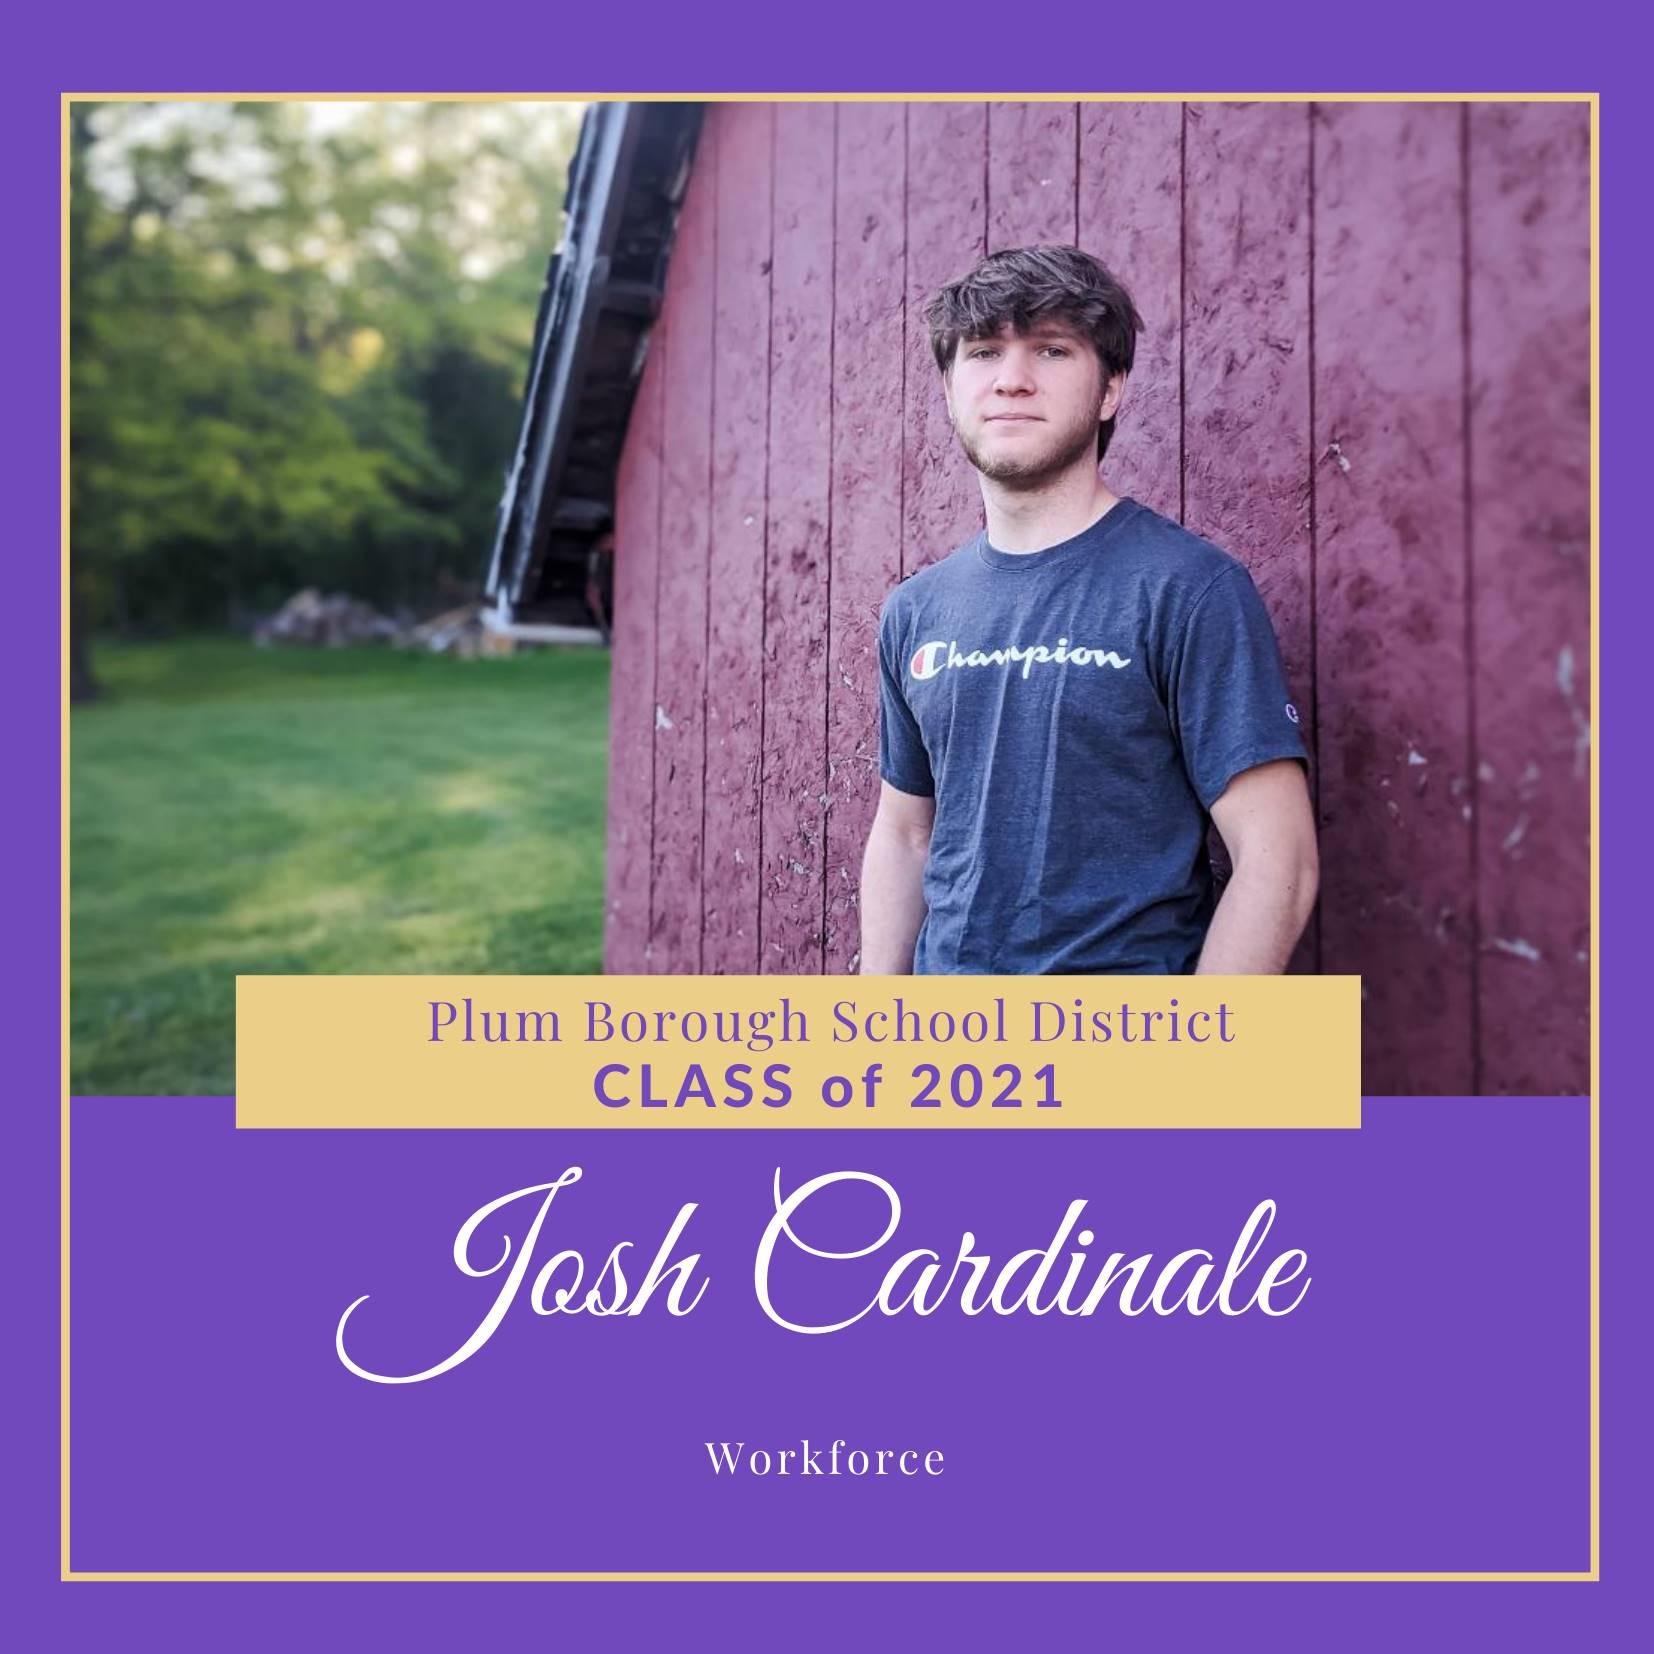 Congratulations to Josh Cardinale, Class of 2021!